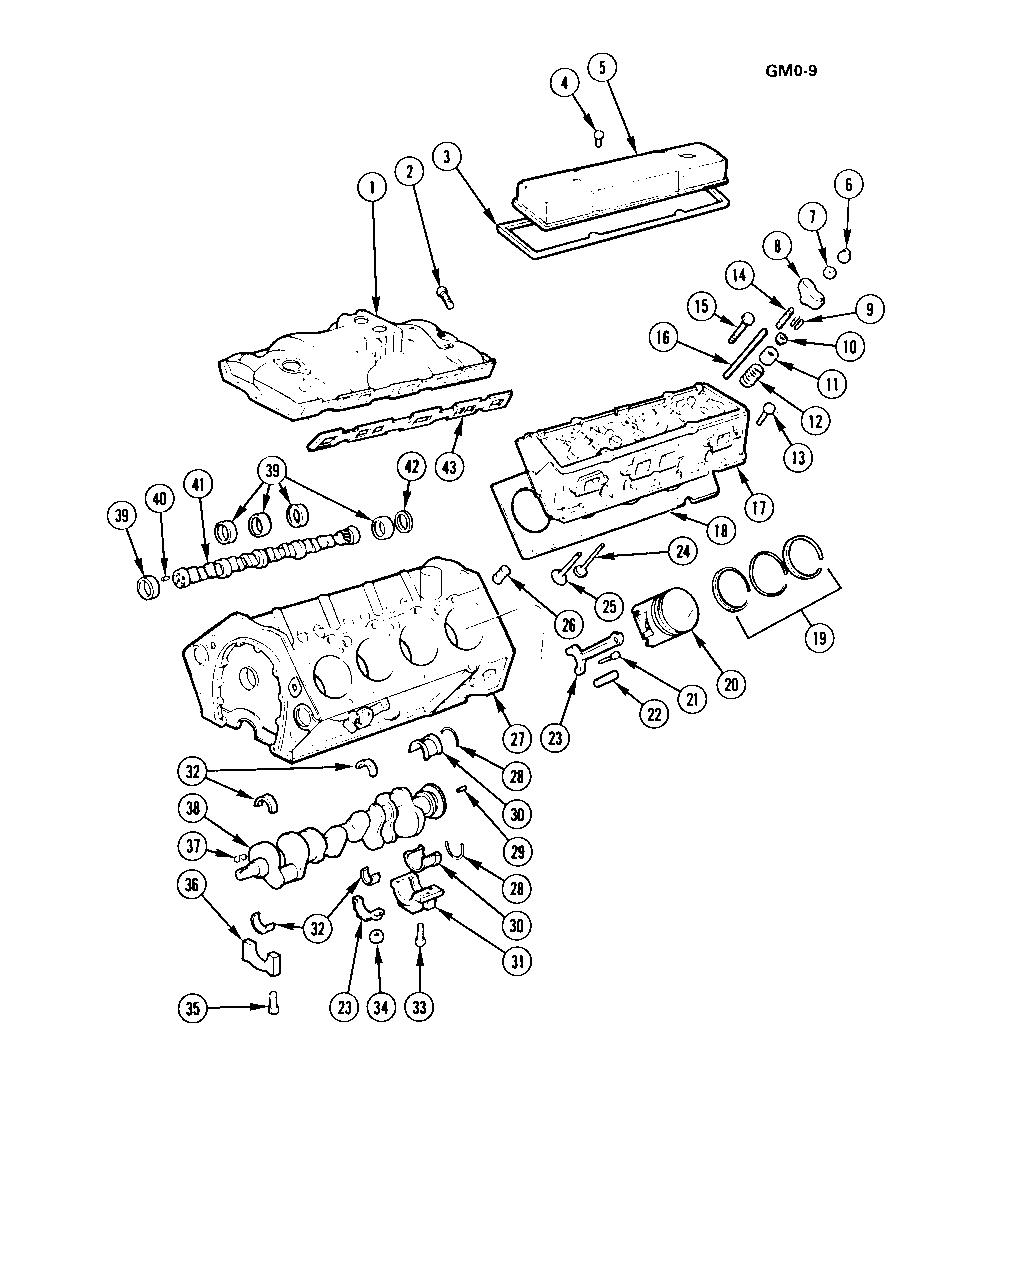 hight resolution of 305 350l v8 engine part i